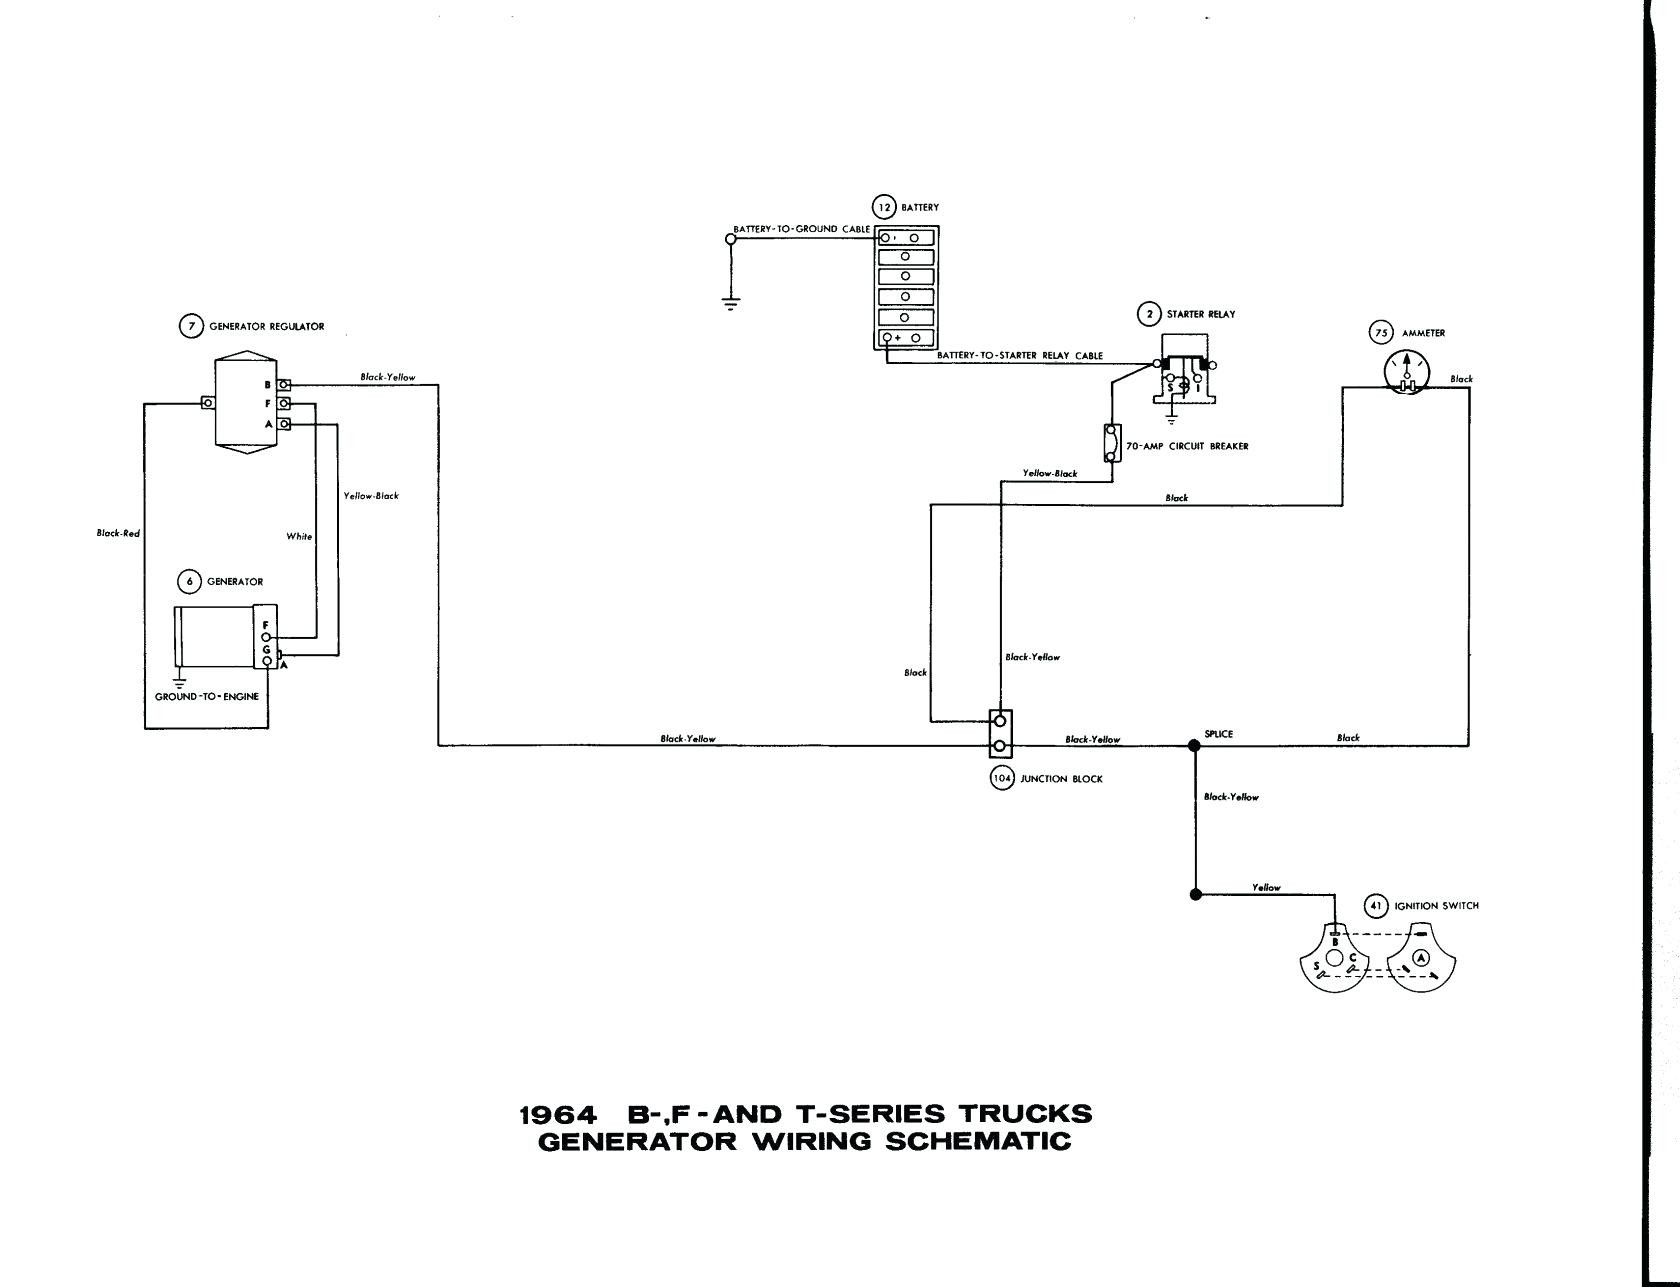 wiring diagram for trailer with electric brakes alternator external voltage regulator 1974 ford sail driv